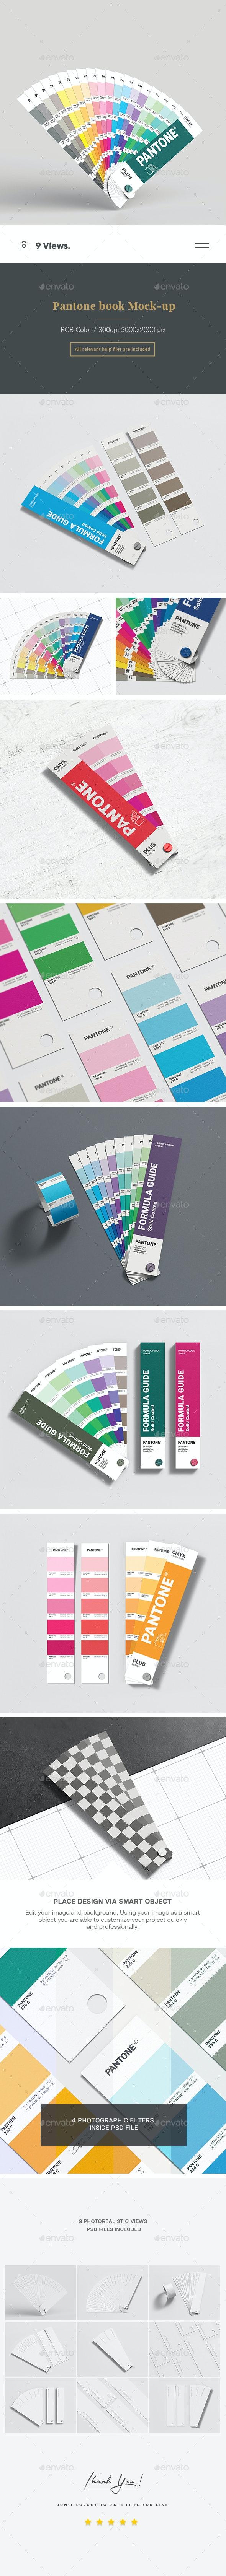 Pantone Book Mock-up - Product Mock-Ups Graphics